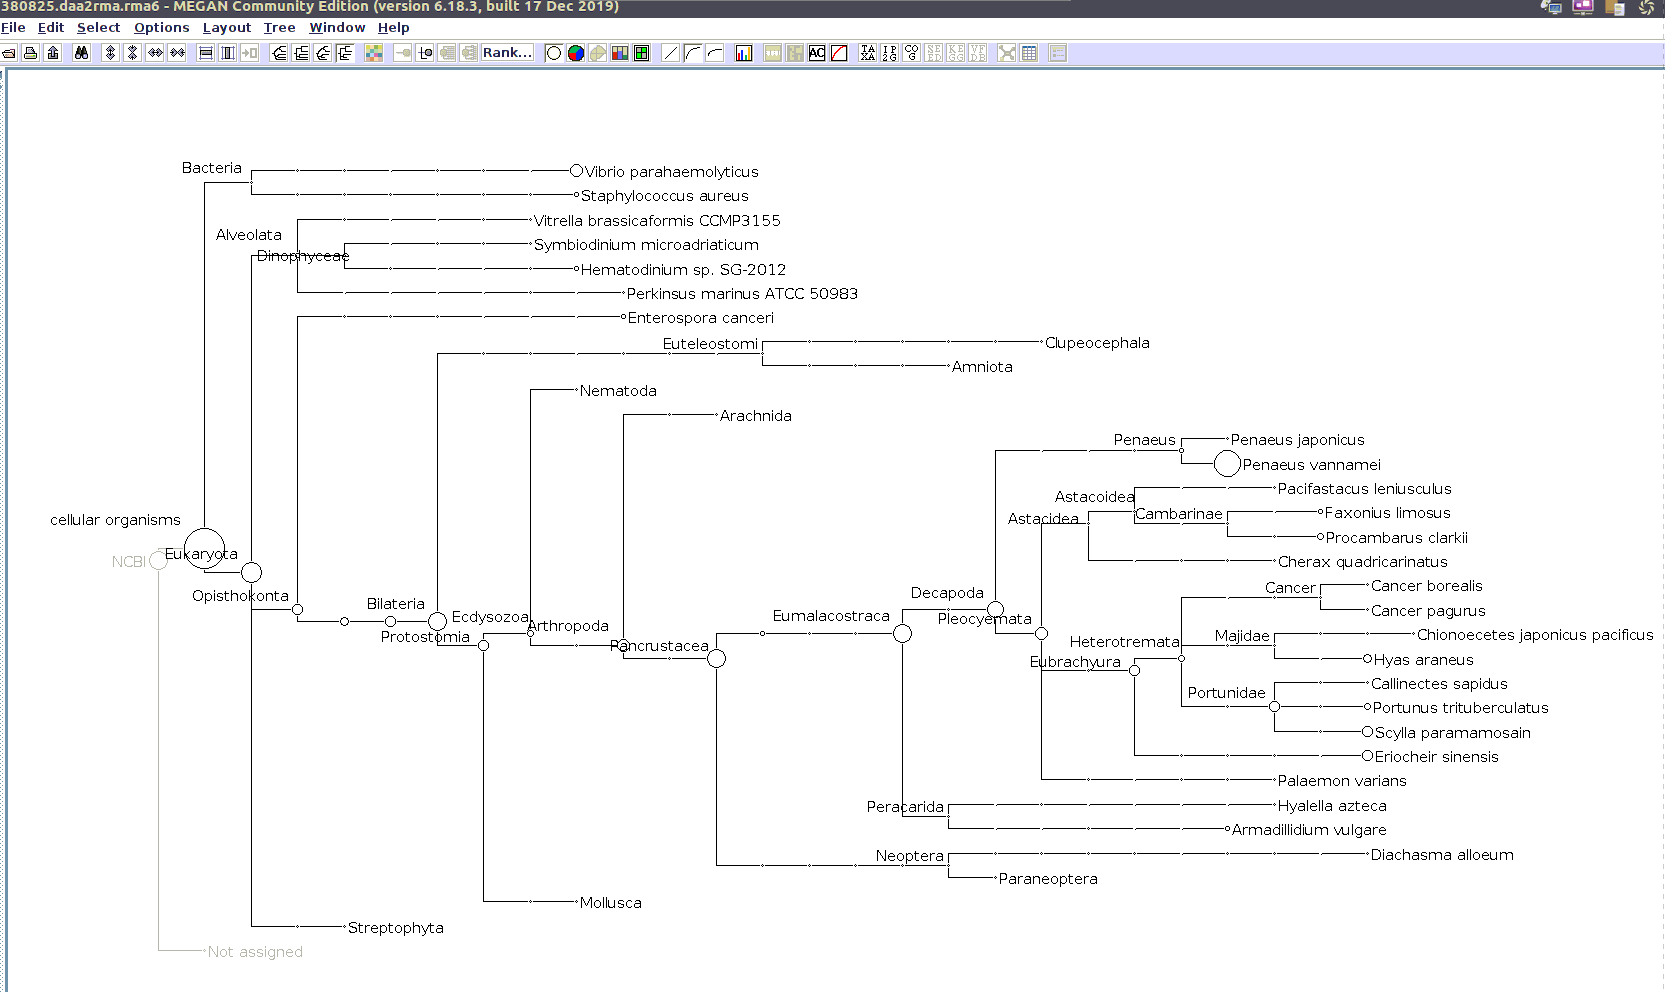 (MEGAN taxonomic tree for 380825